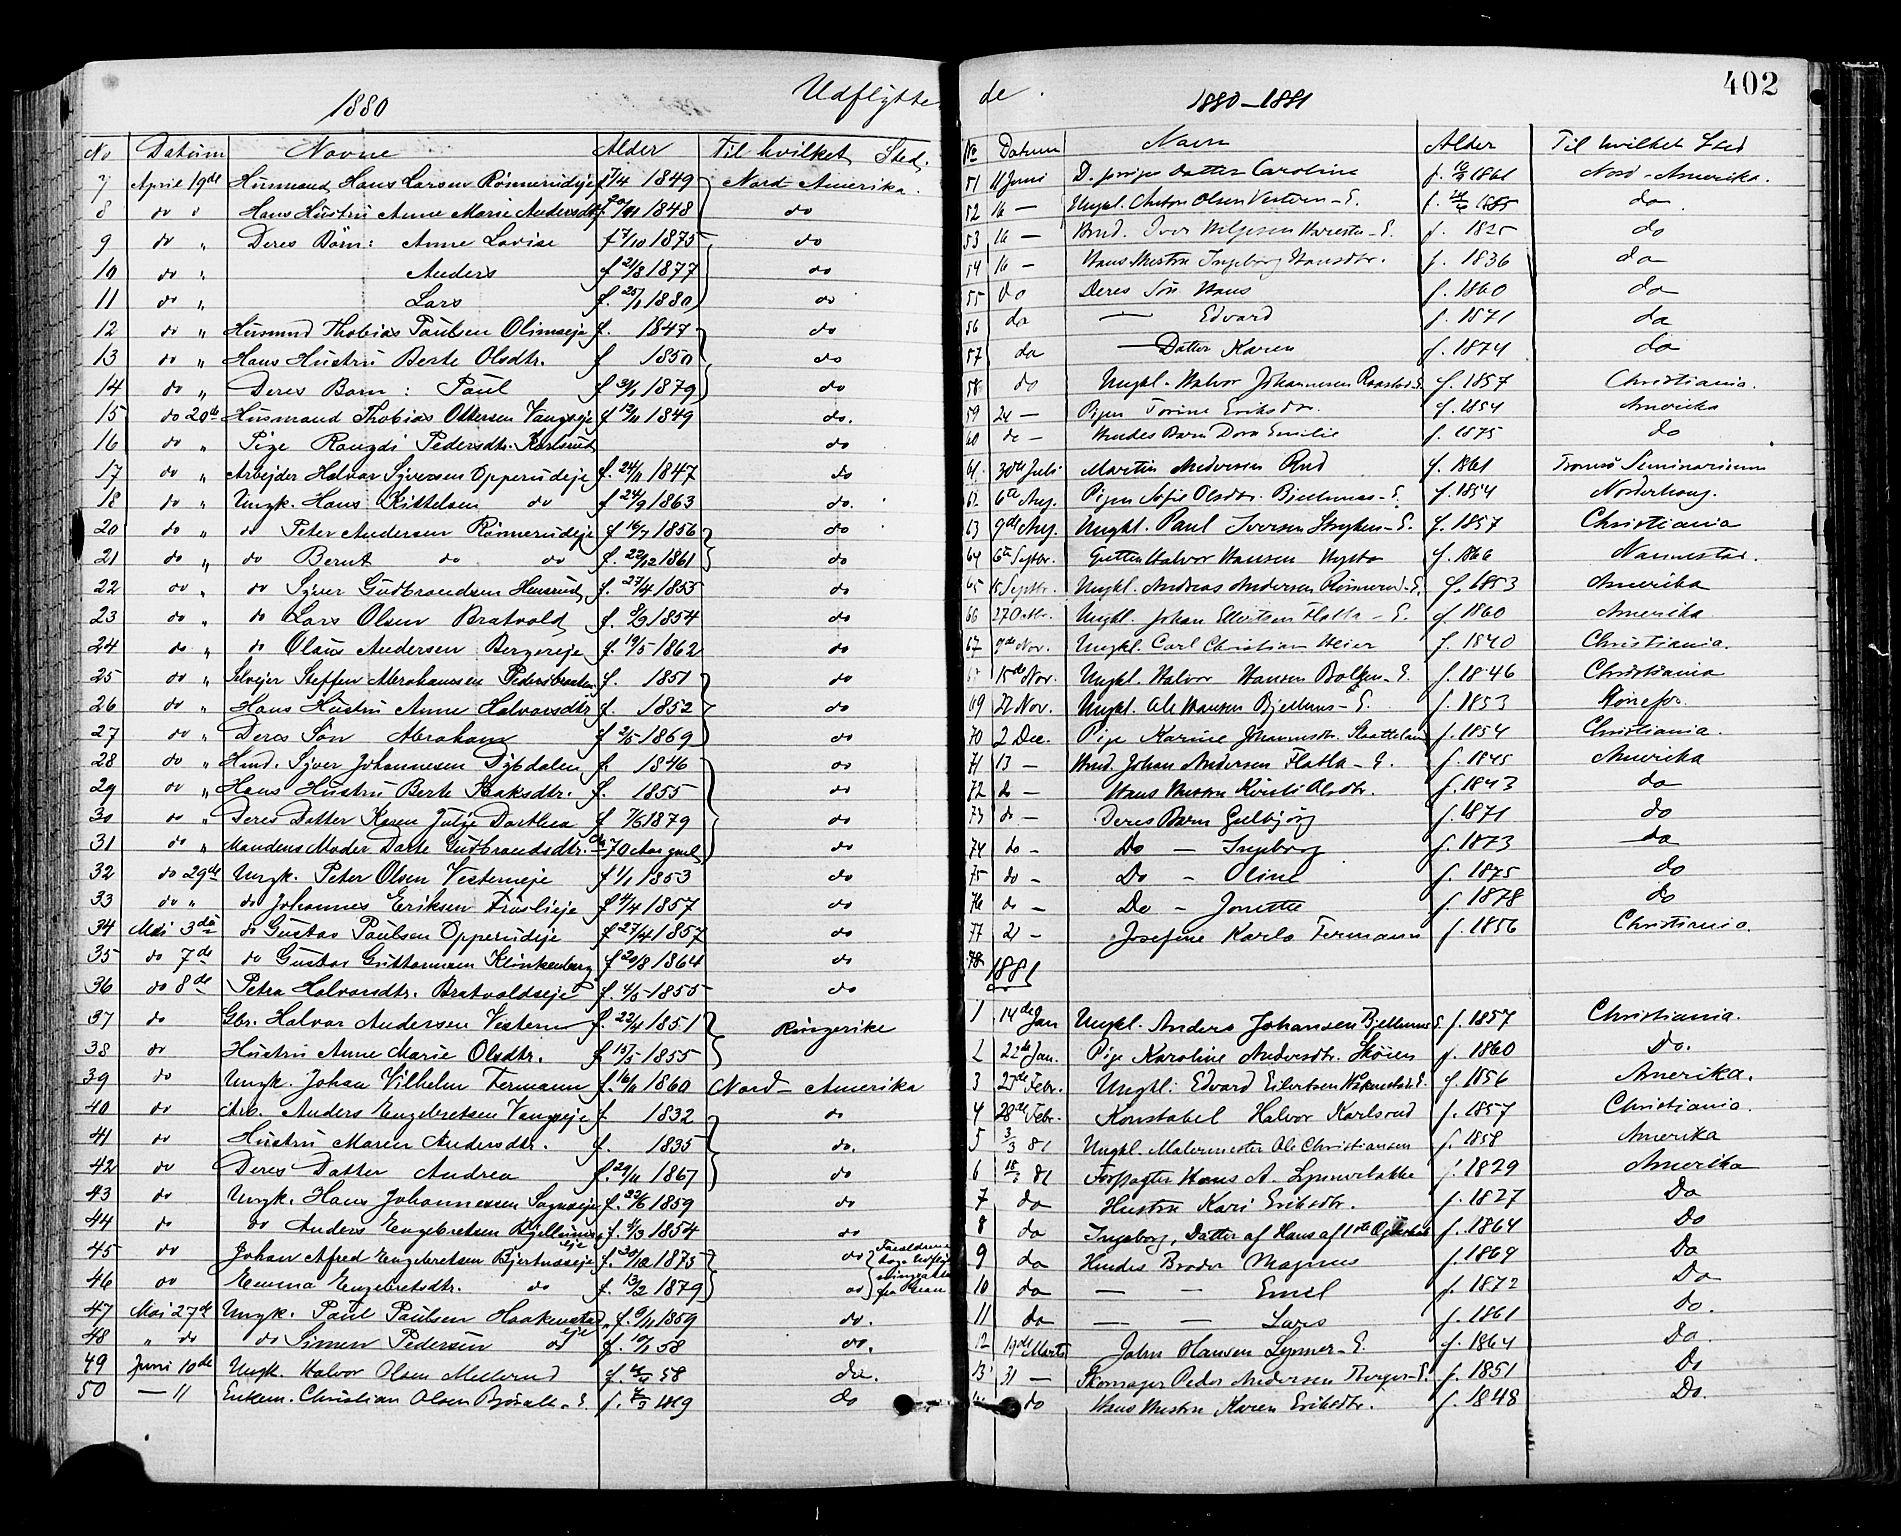 SAH, Jevnaker prestekontor, Ministerialbok nr. 8, 1877-1890, s. 402